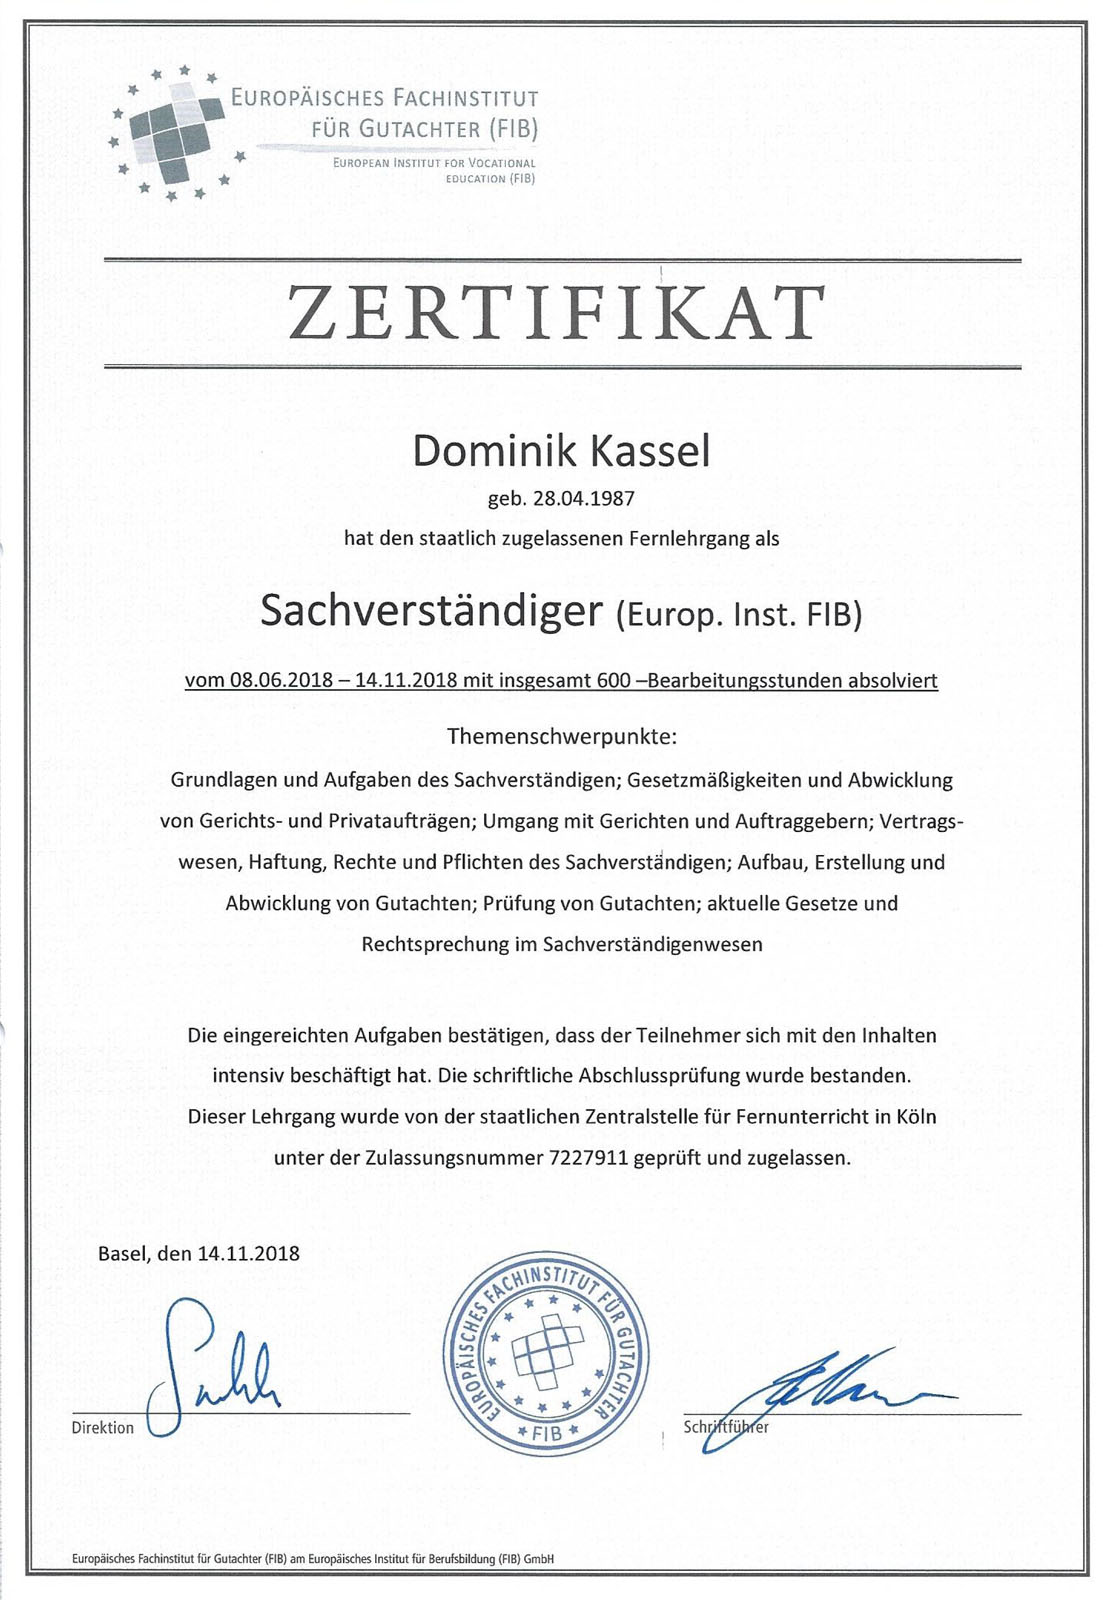 Zertifikate Dominik Kassel - Sachverständiger